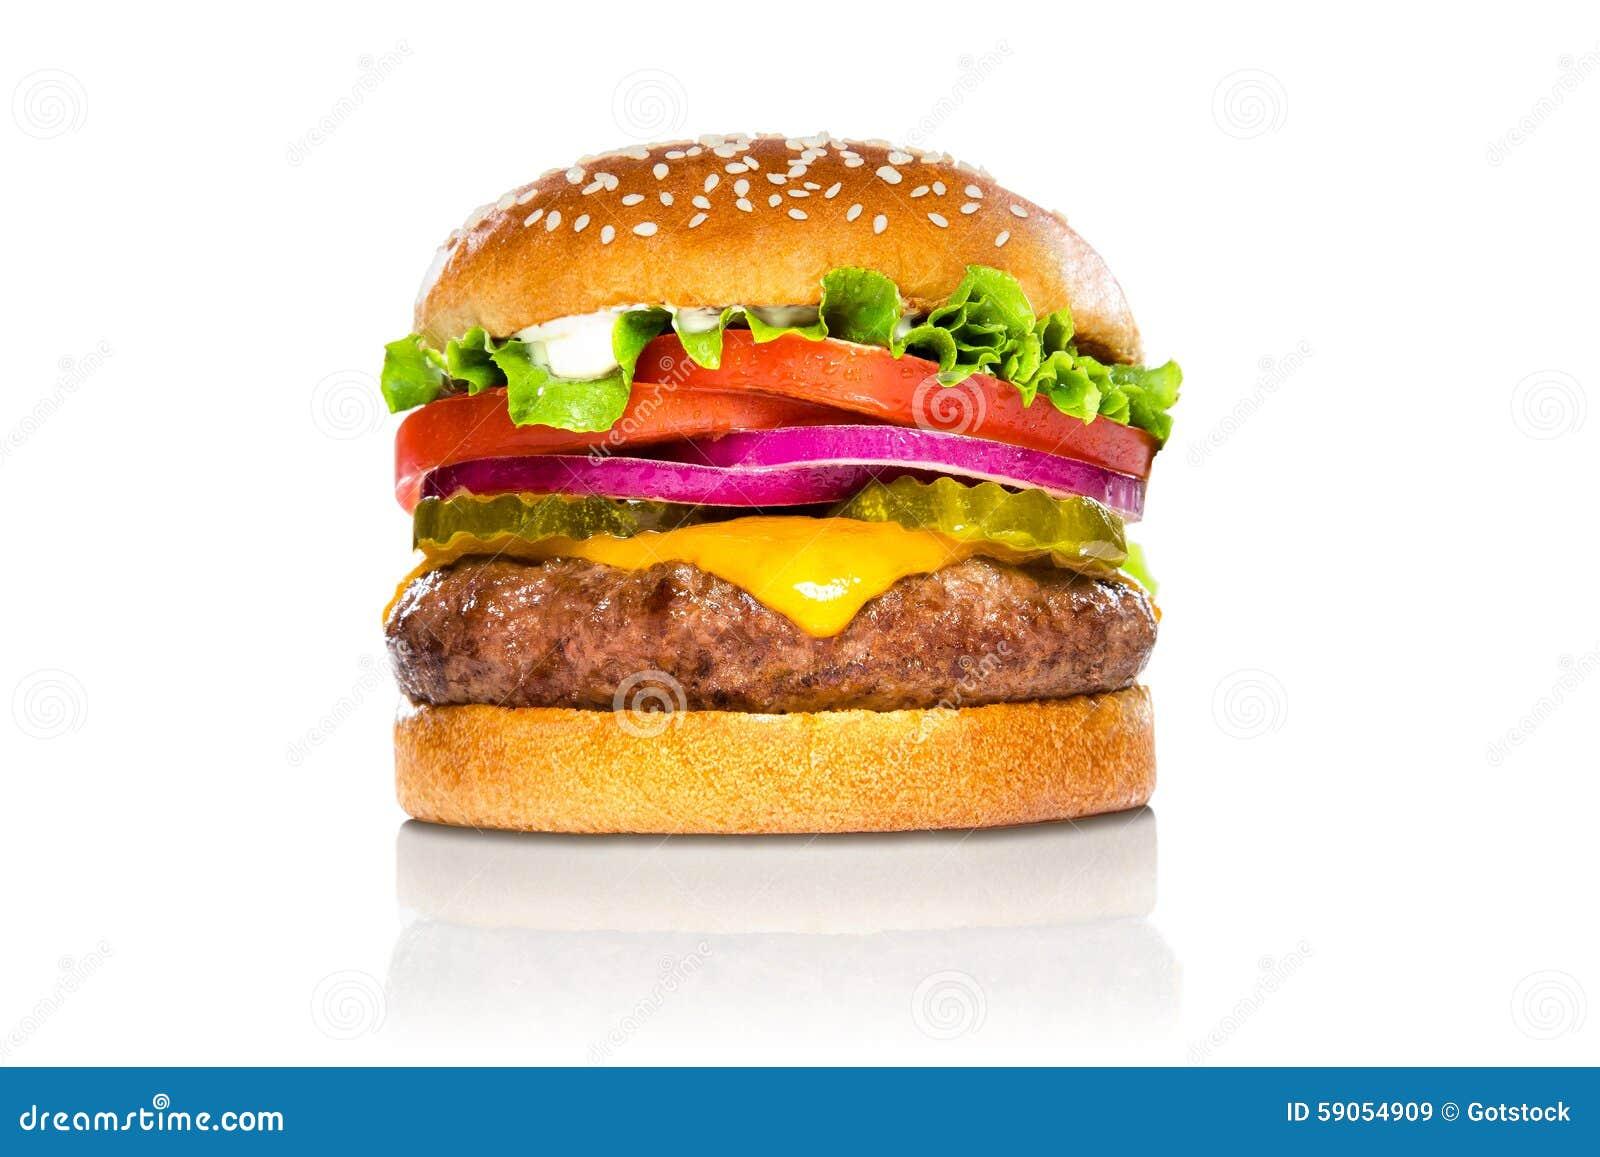 perfect hamburger classic burger american cheeseburger. Black Bedroom Furniture Sets. Home Design Ideas